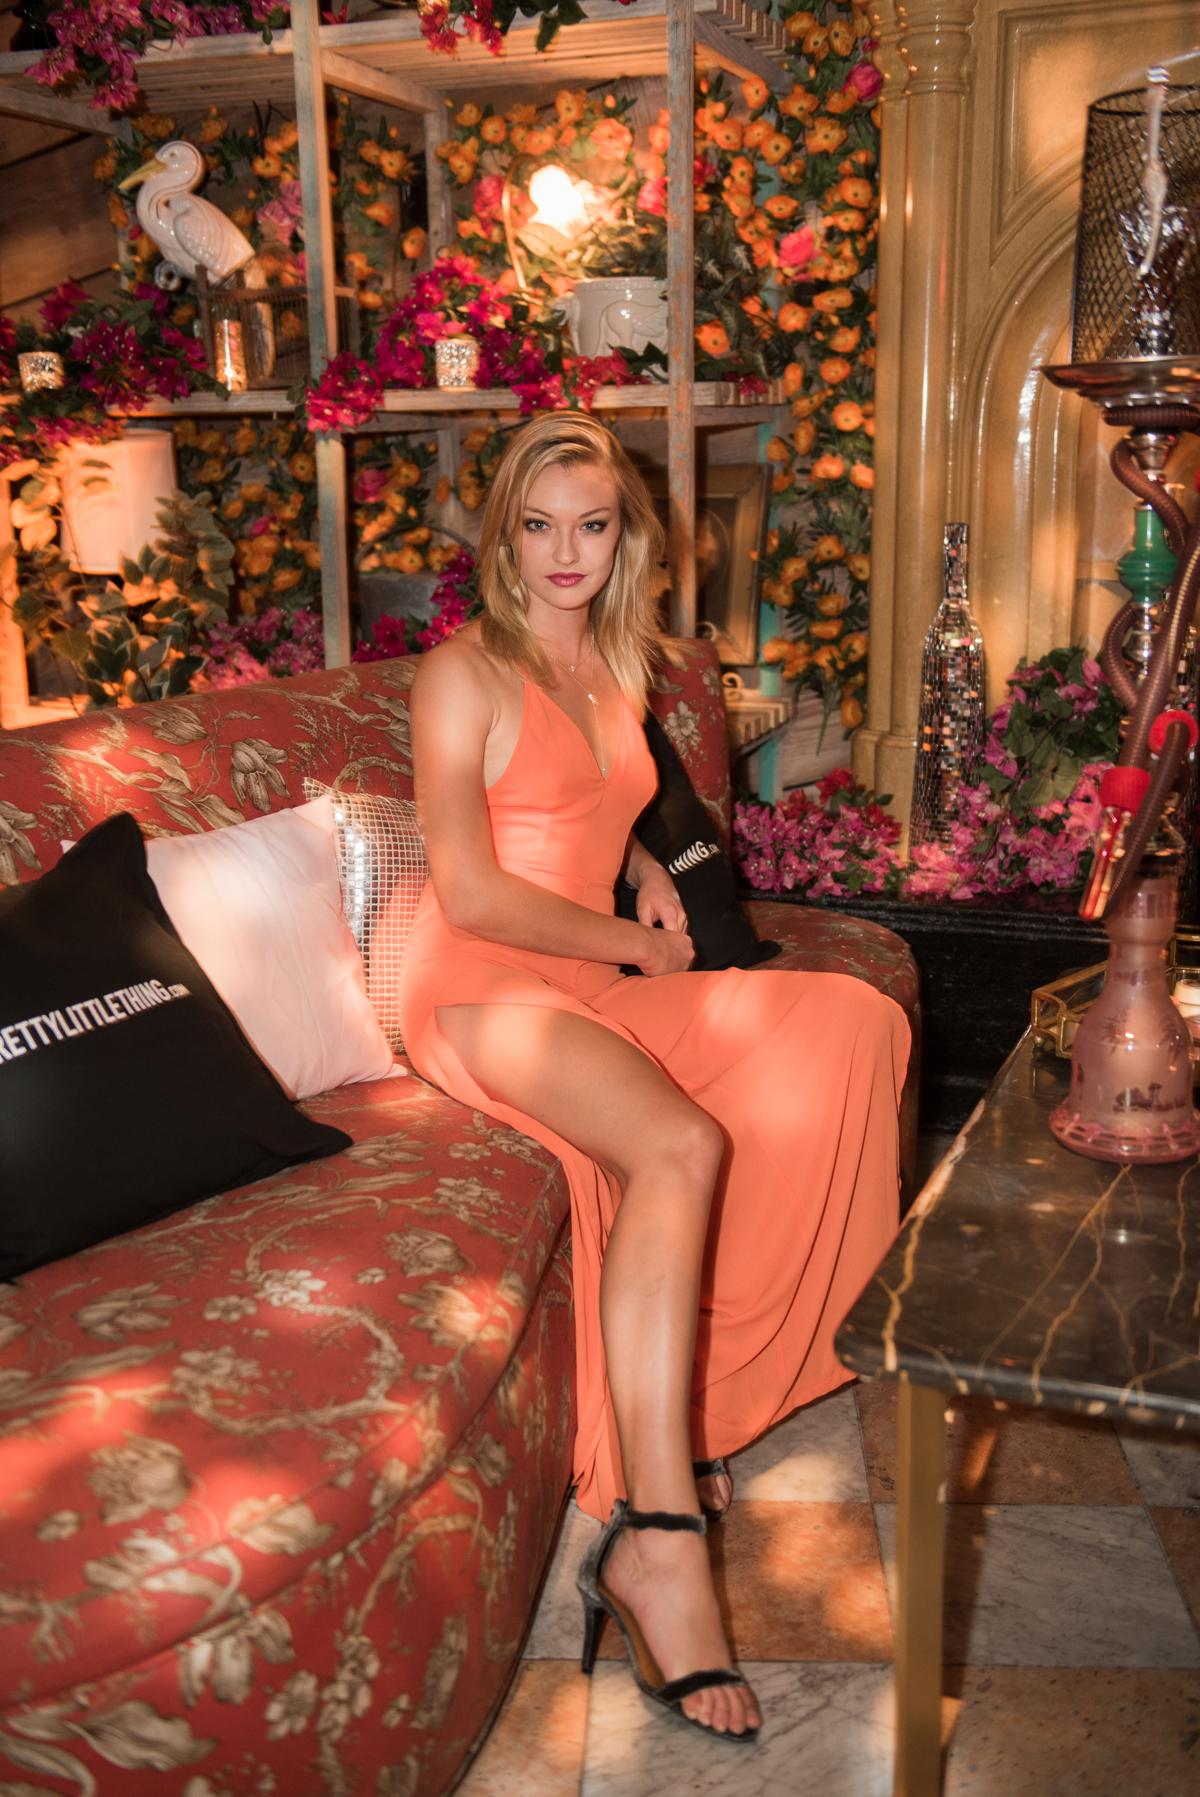 PrettyLittleThing PLT X Kourtney Kardashian Collection Celebrity Launch Party Celeste Gants in party.jpg